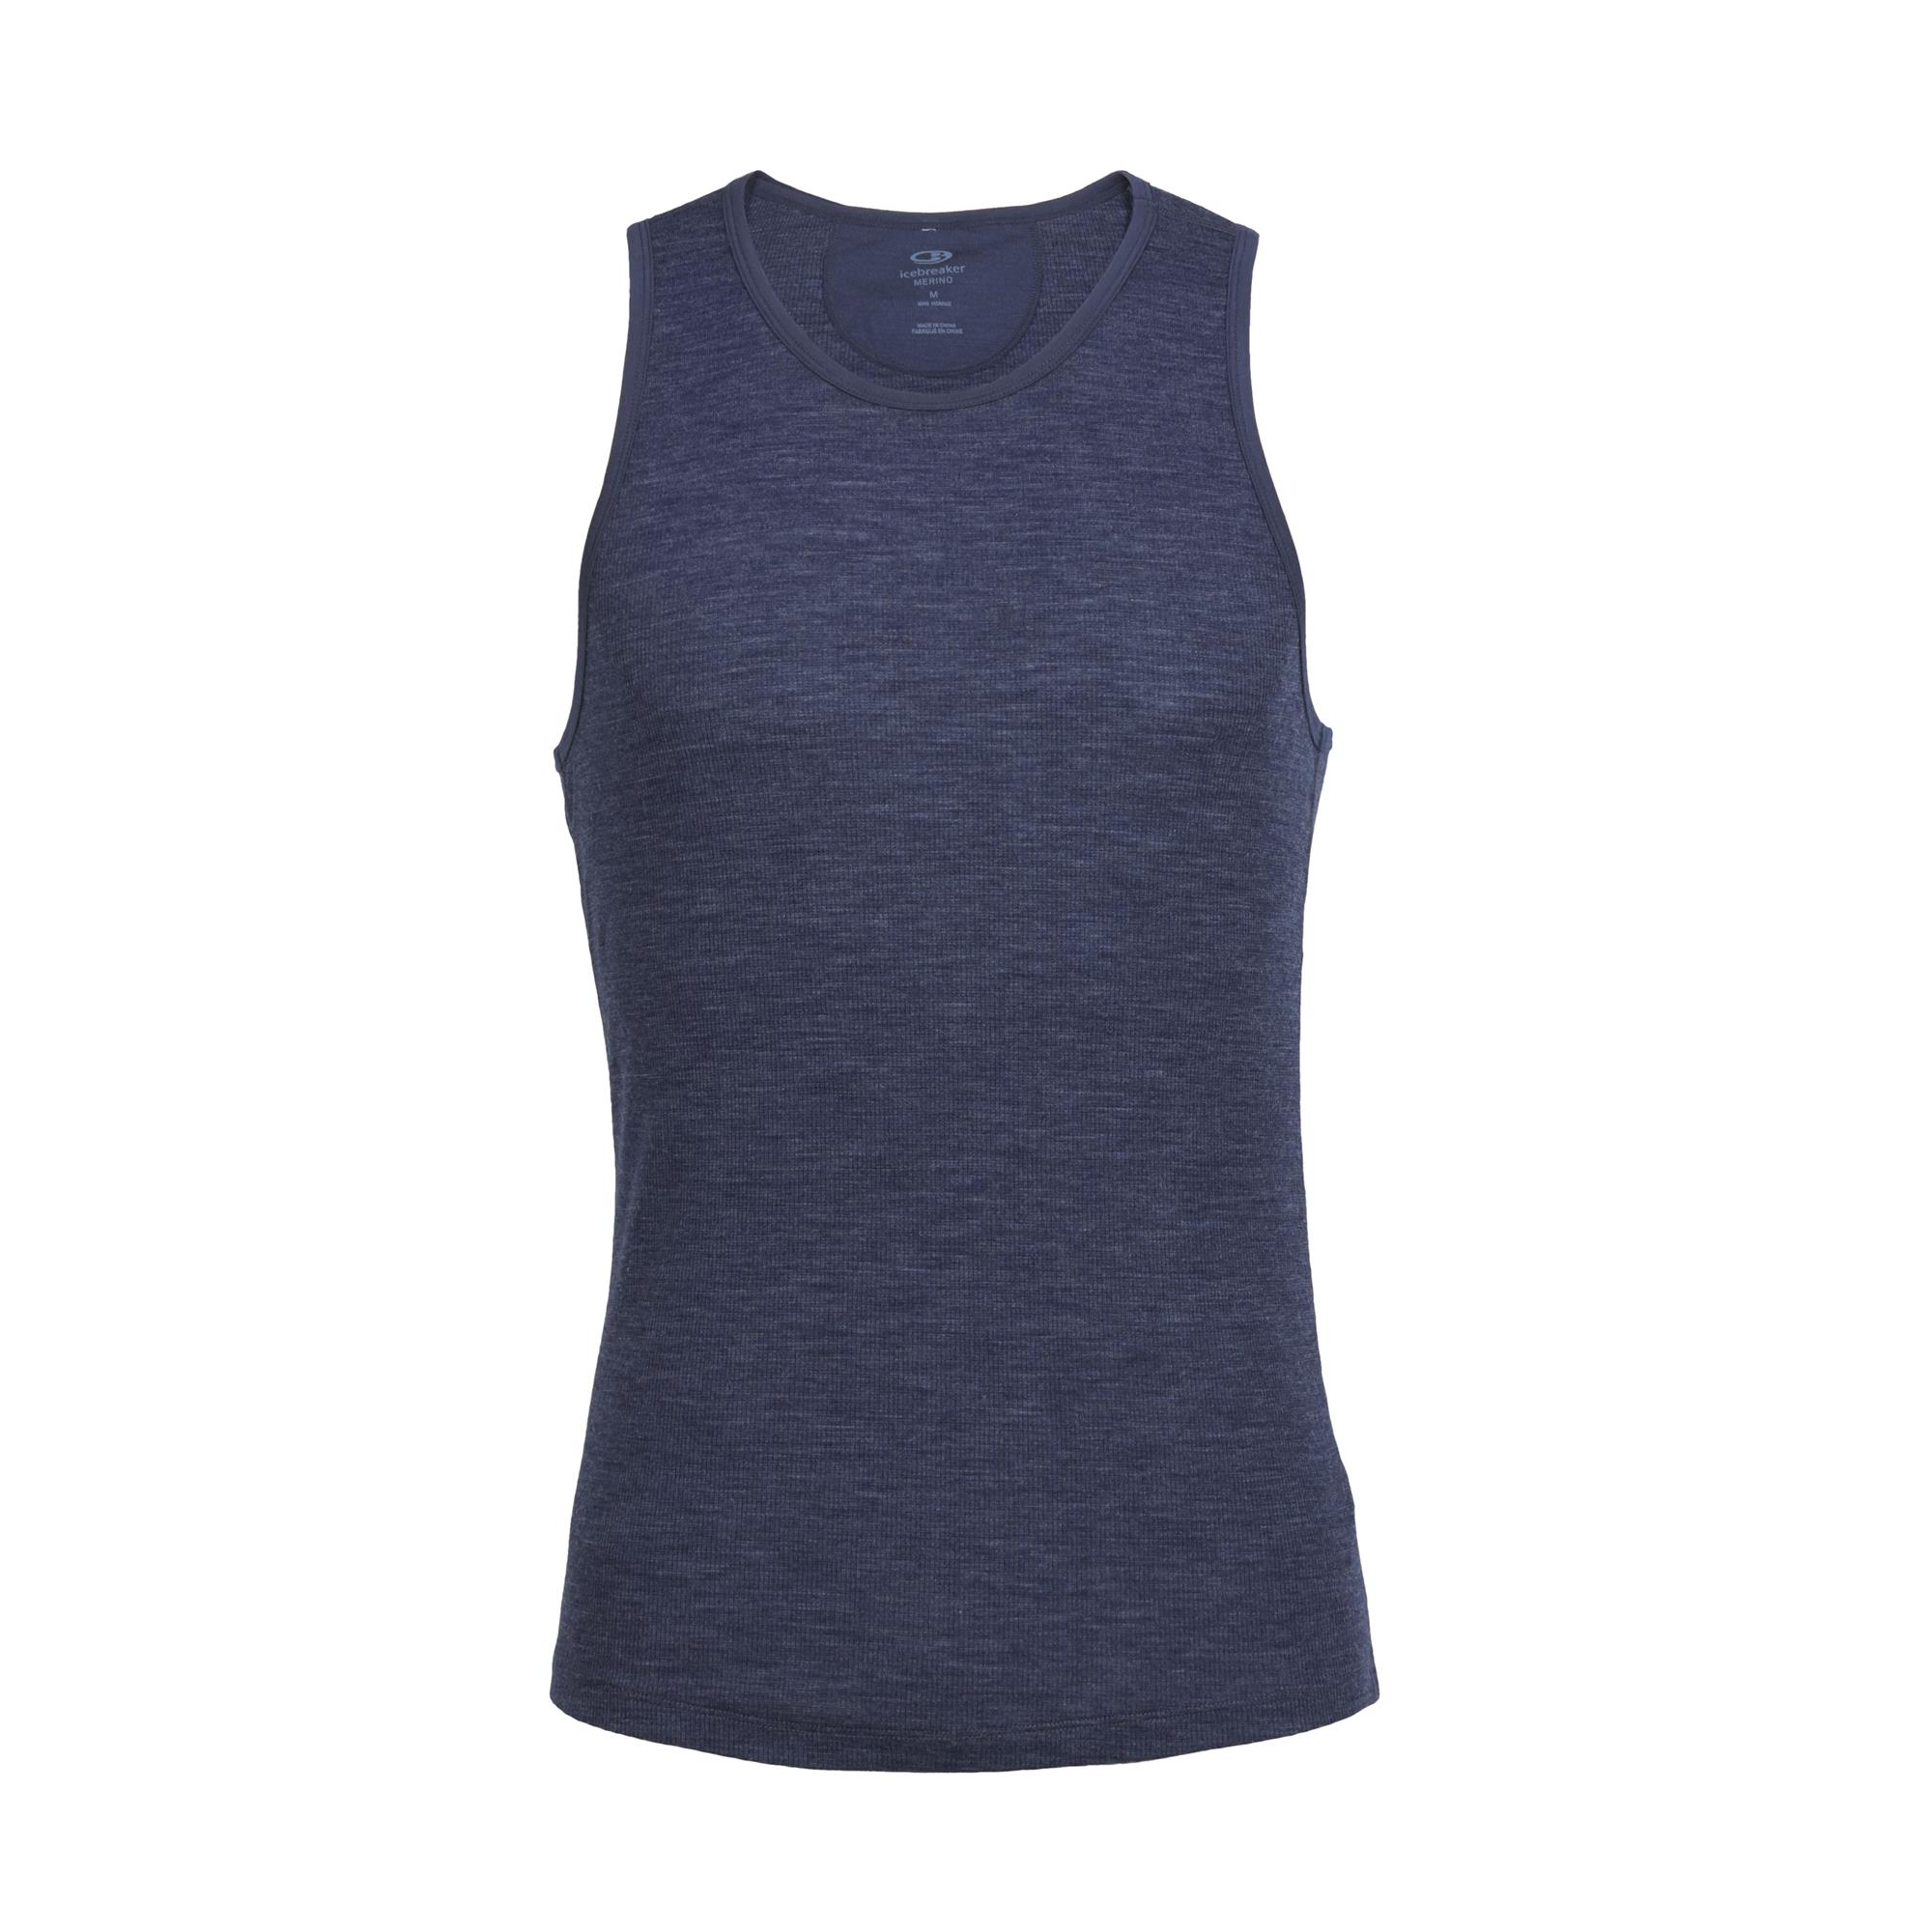 Icebreaker Anatomica Rib Tank Unterhemd dunkelblau Herren jetztbilligerkaufen